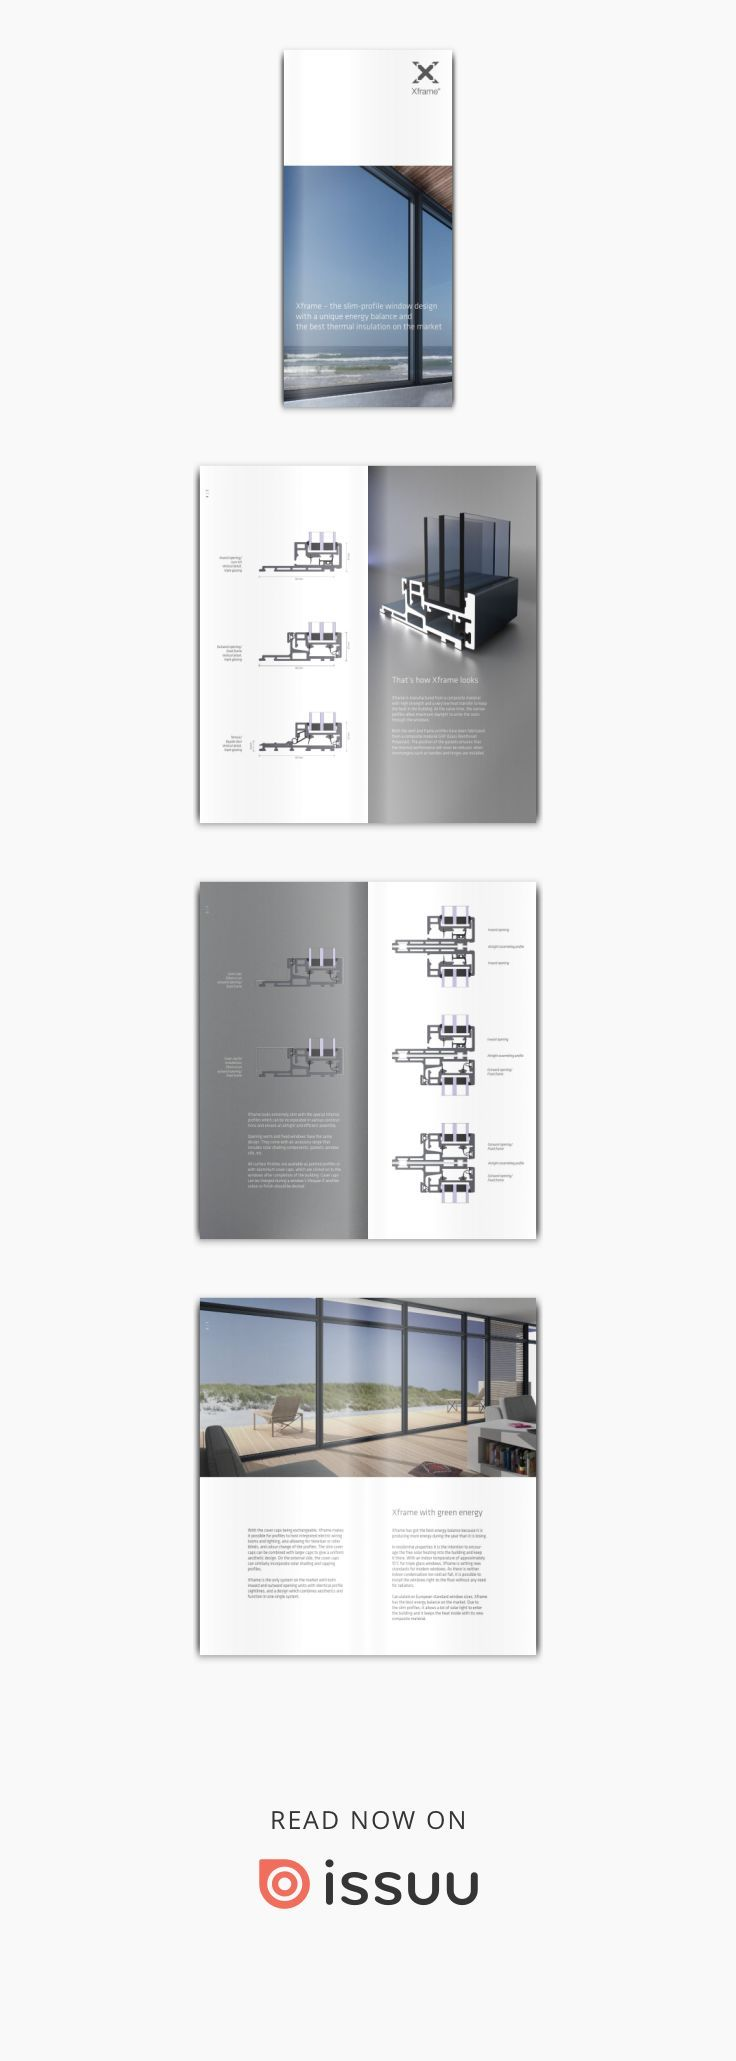 Xframe GRP window system brochure UK 2011